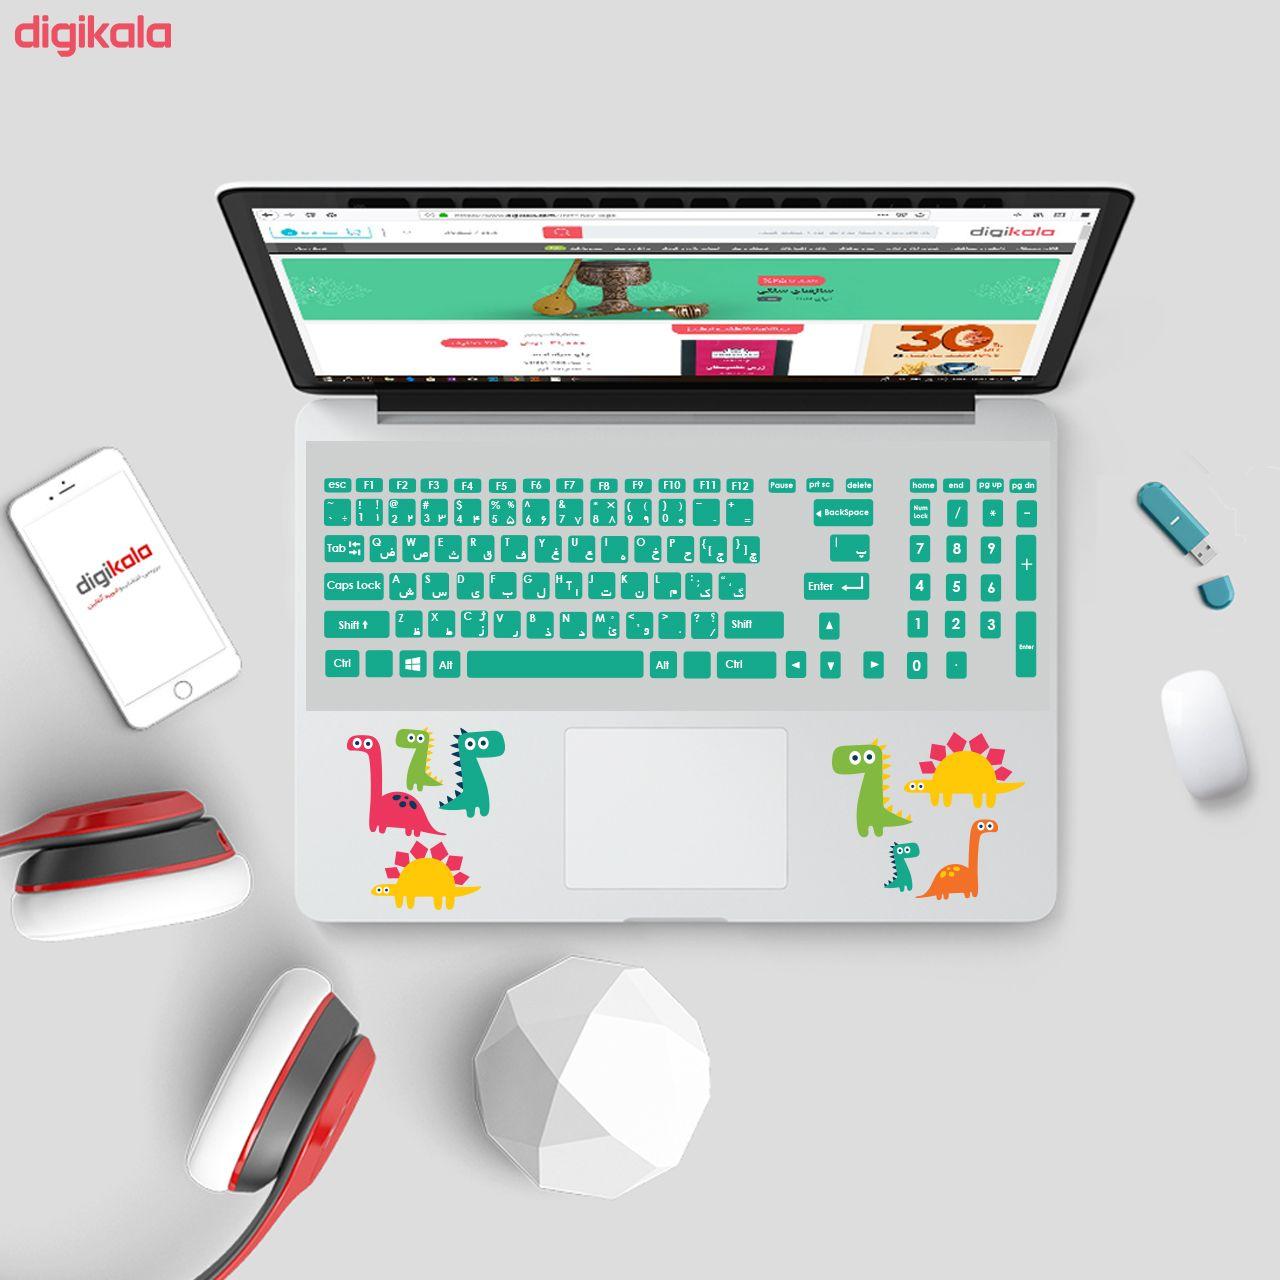 استیکر لپ تاپ صالسو آرت مدل 5029 hk به همراه برچسب حروف فارسی کیبورد main 1 2